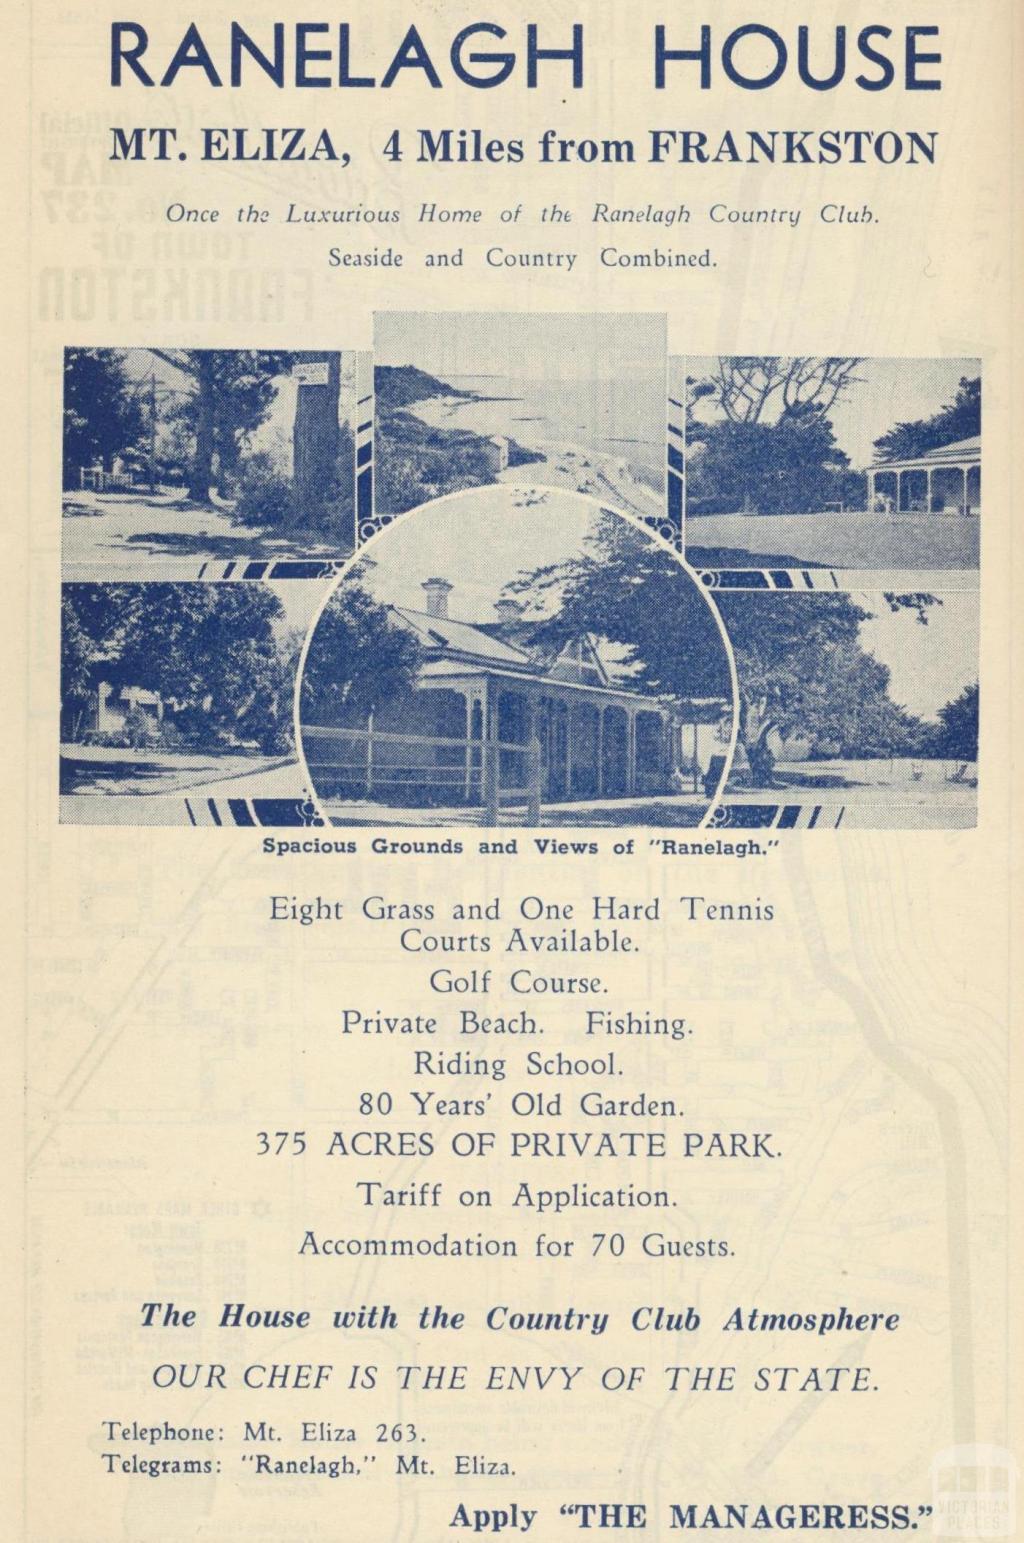 Ranelagh House, Mount Eliza, 1949